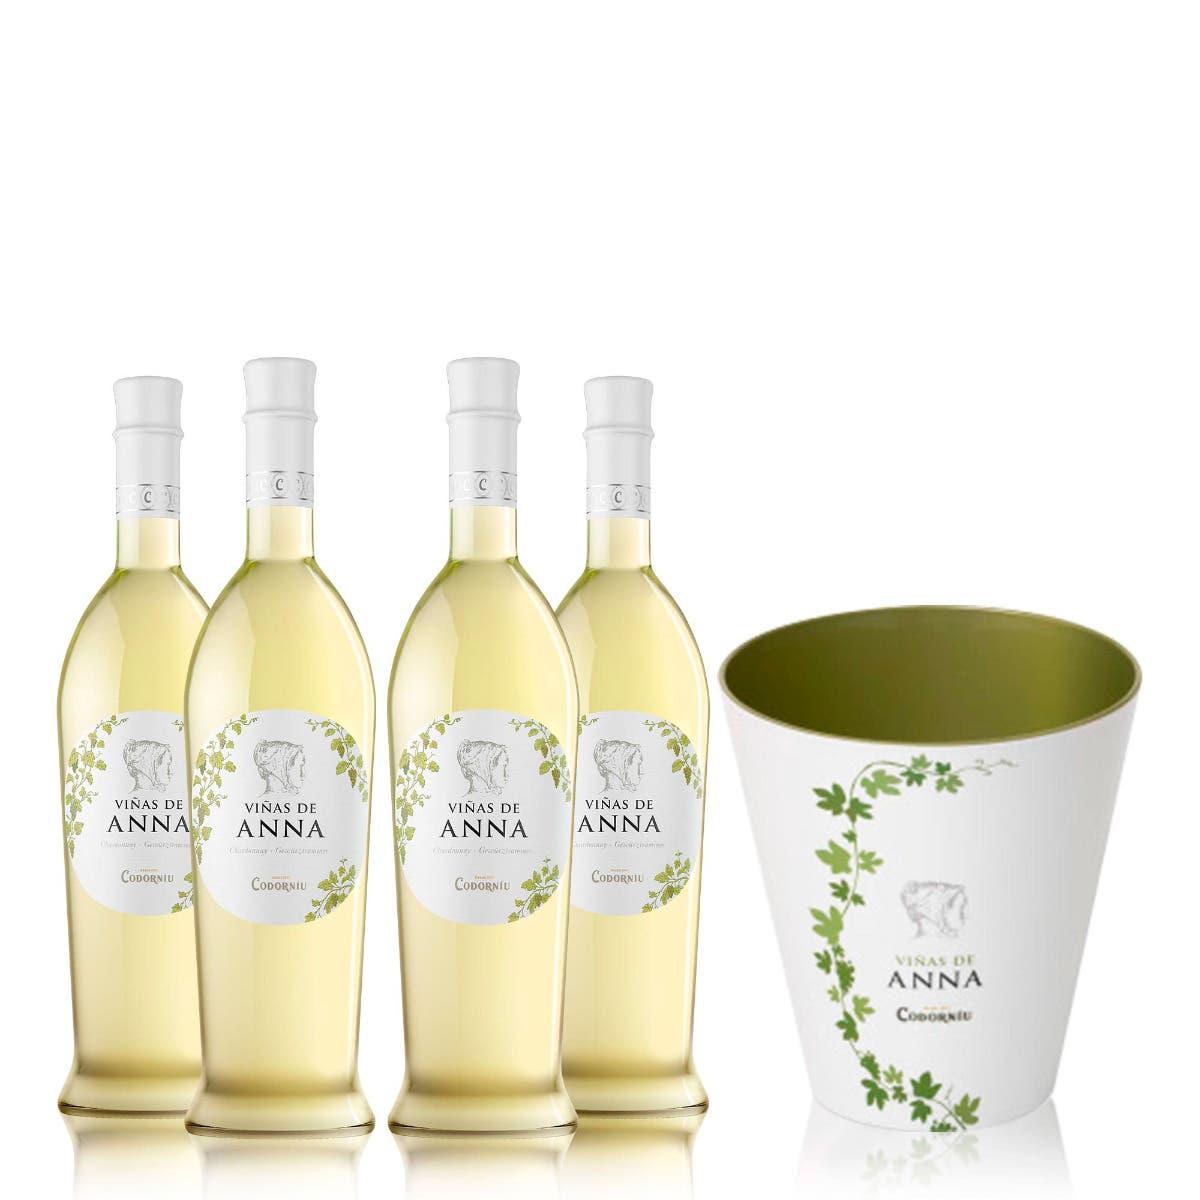 4 Viñas de Anna Chardonnay + FREE BUCKET